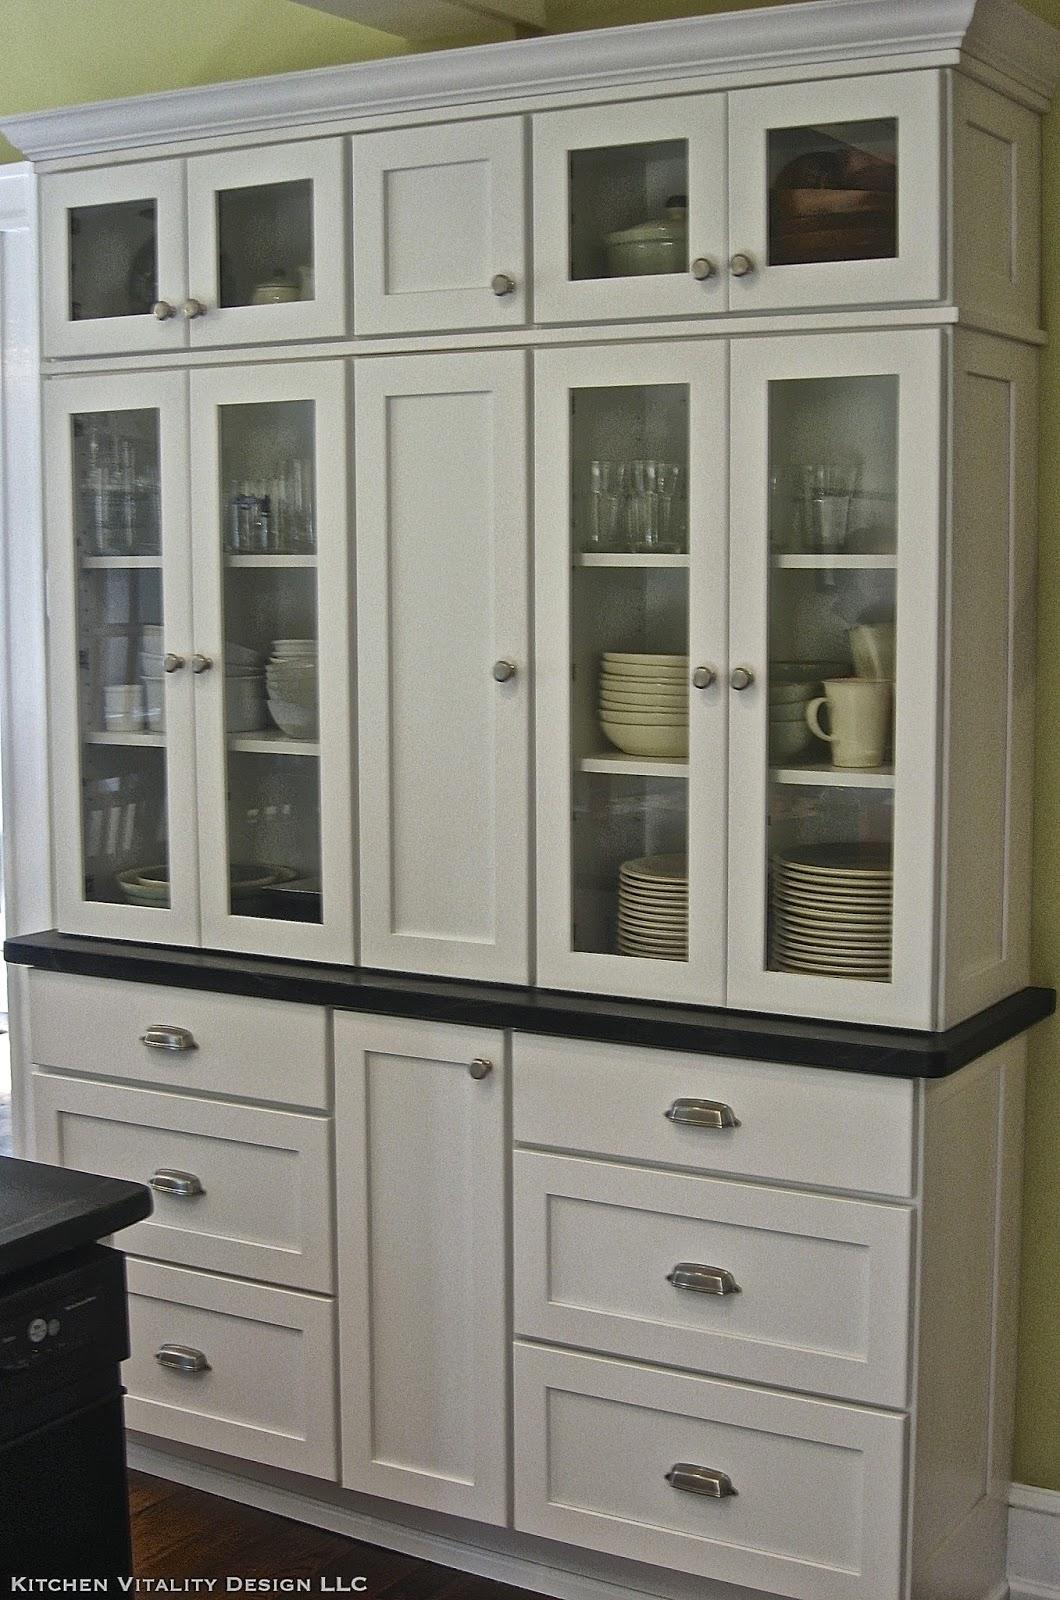 Ask A Kitchen Designer: A Built-in Kitchen Hutch